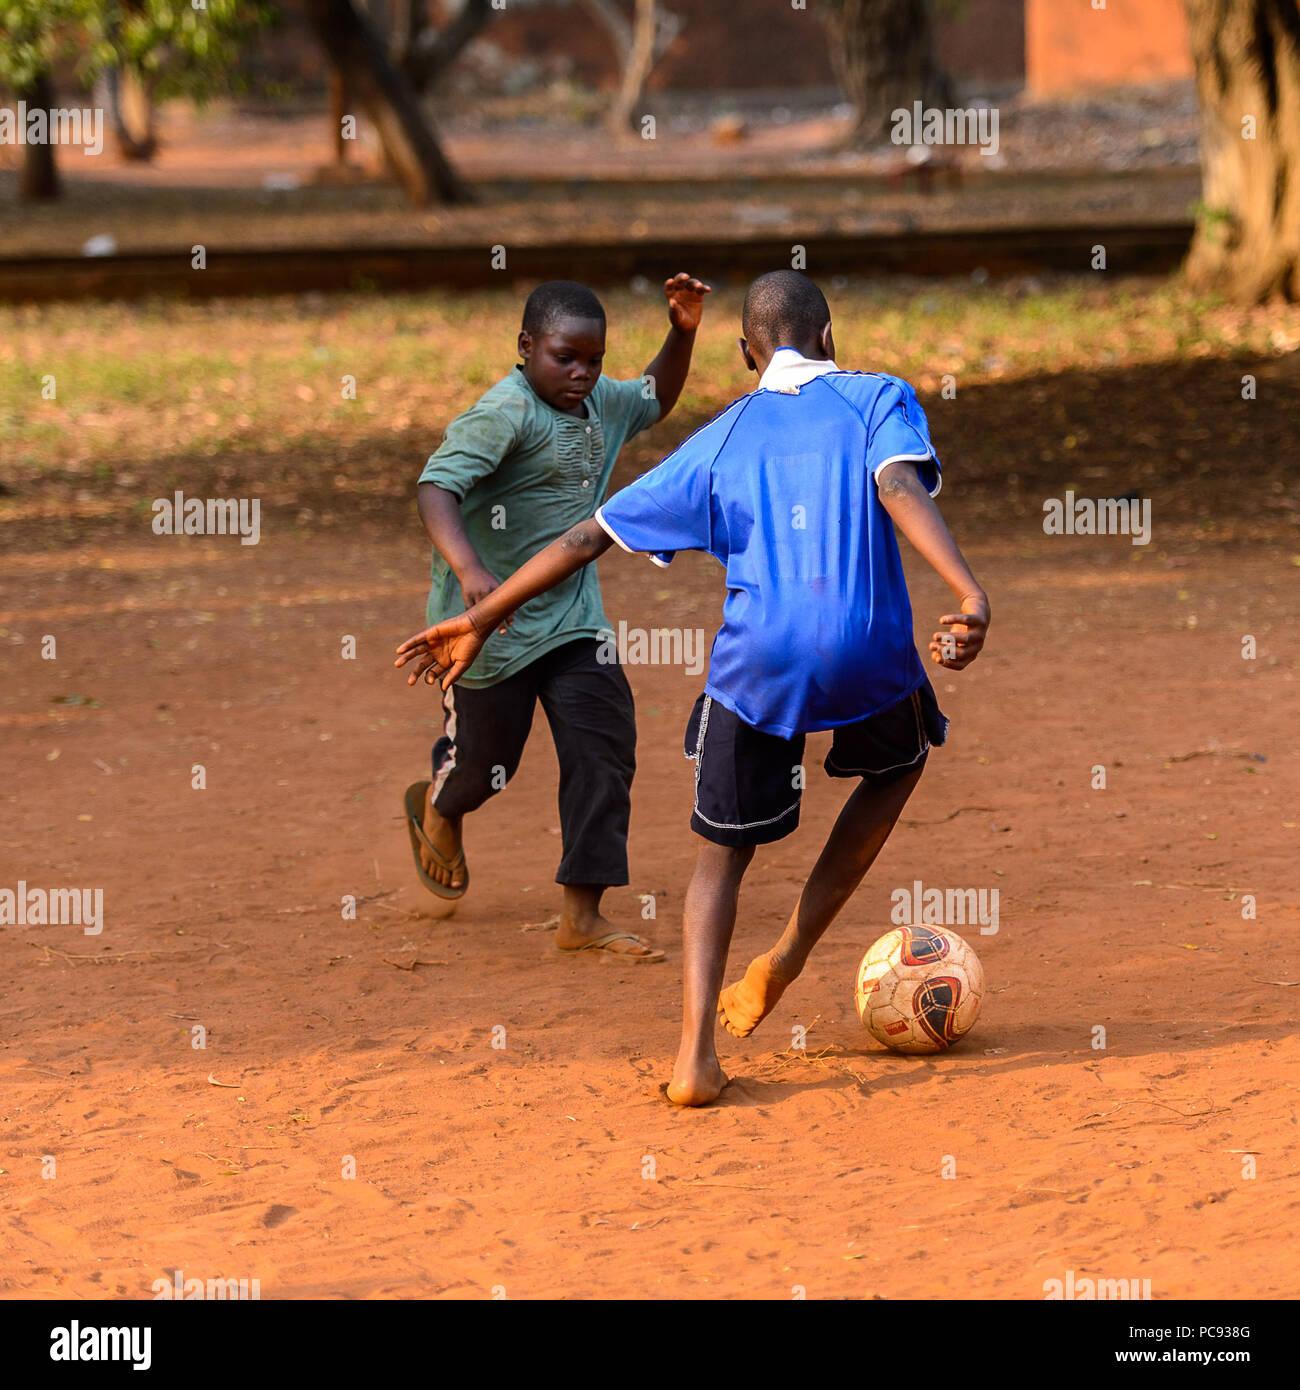 Bare football